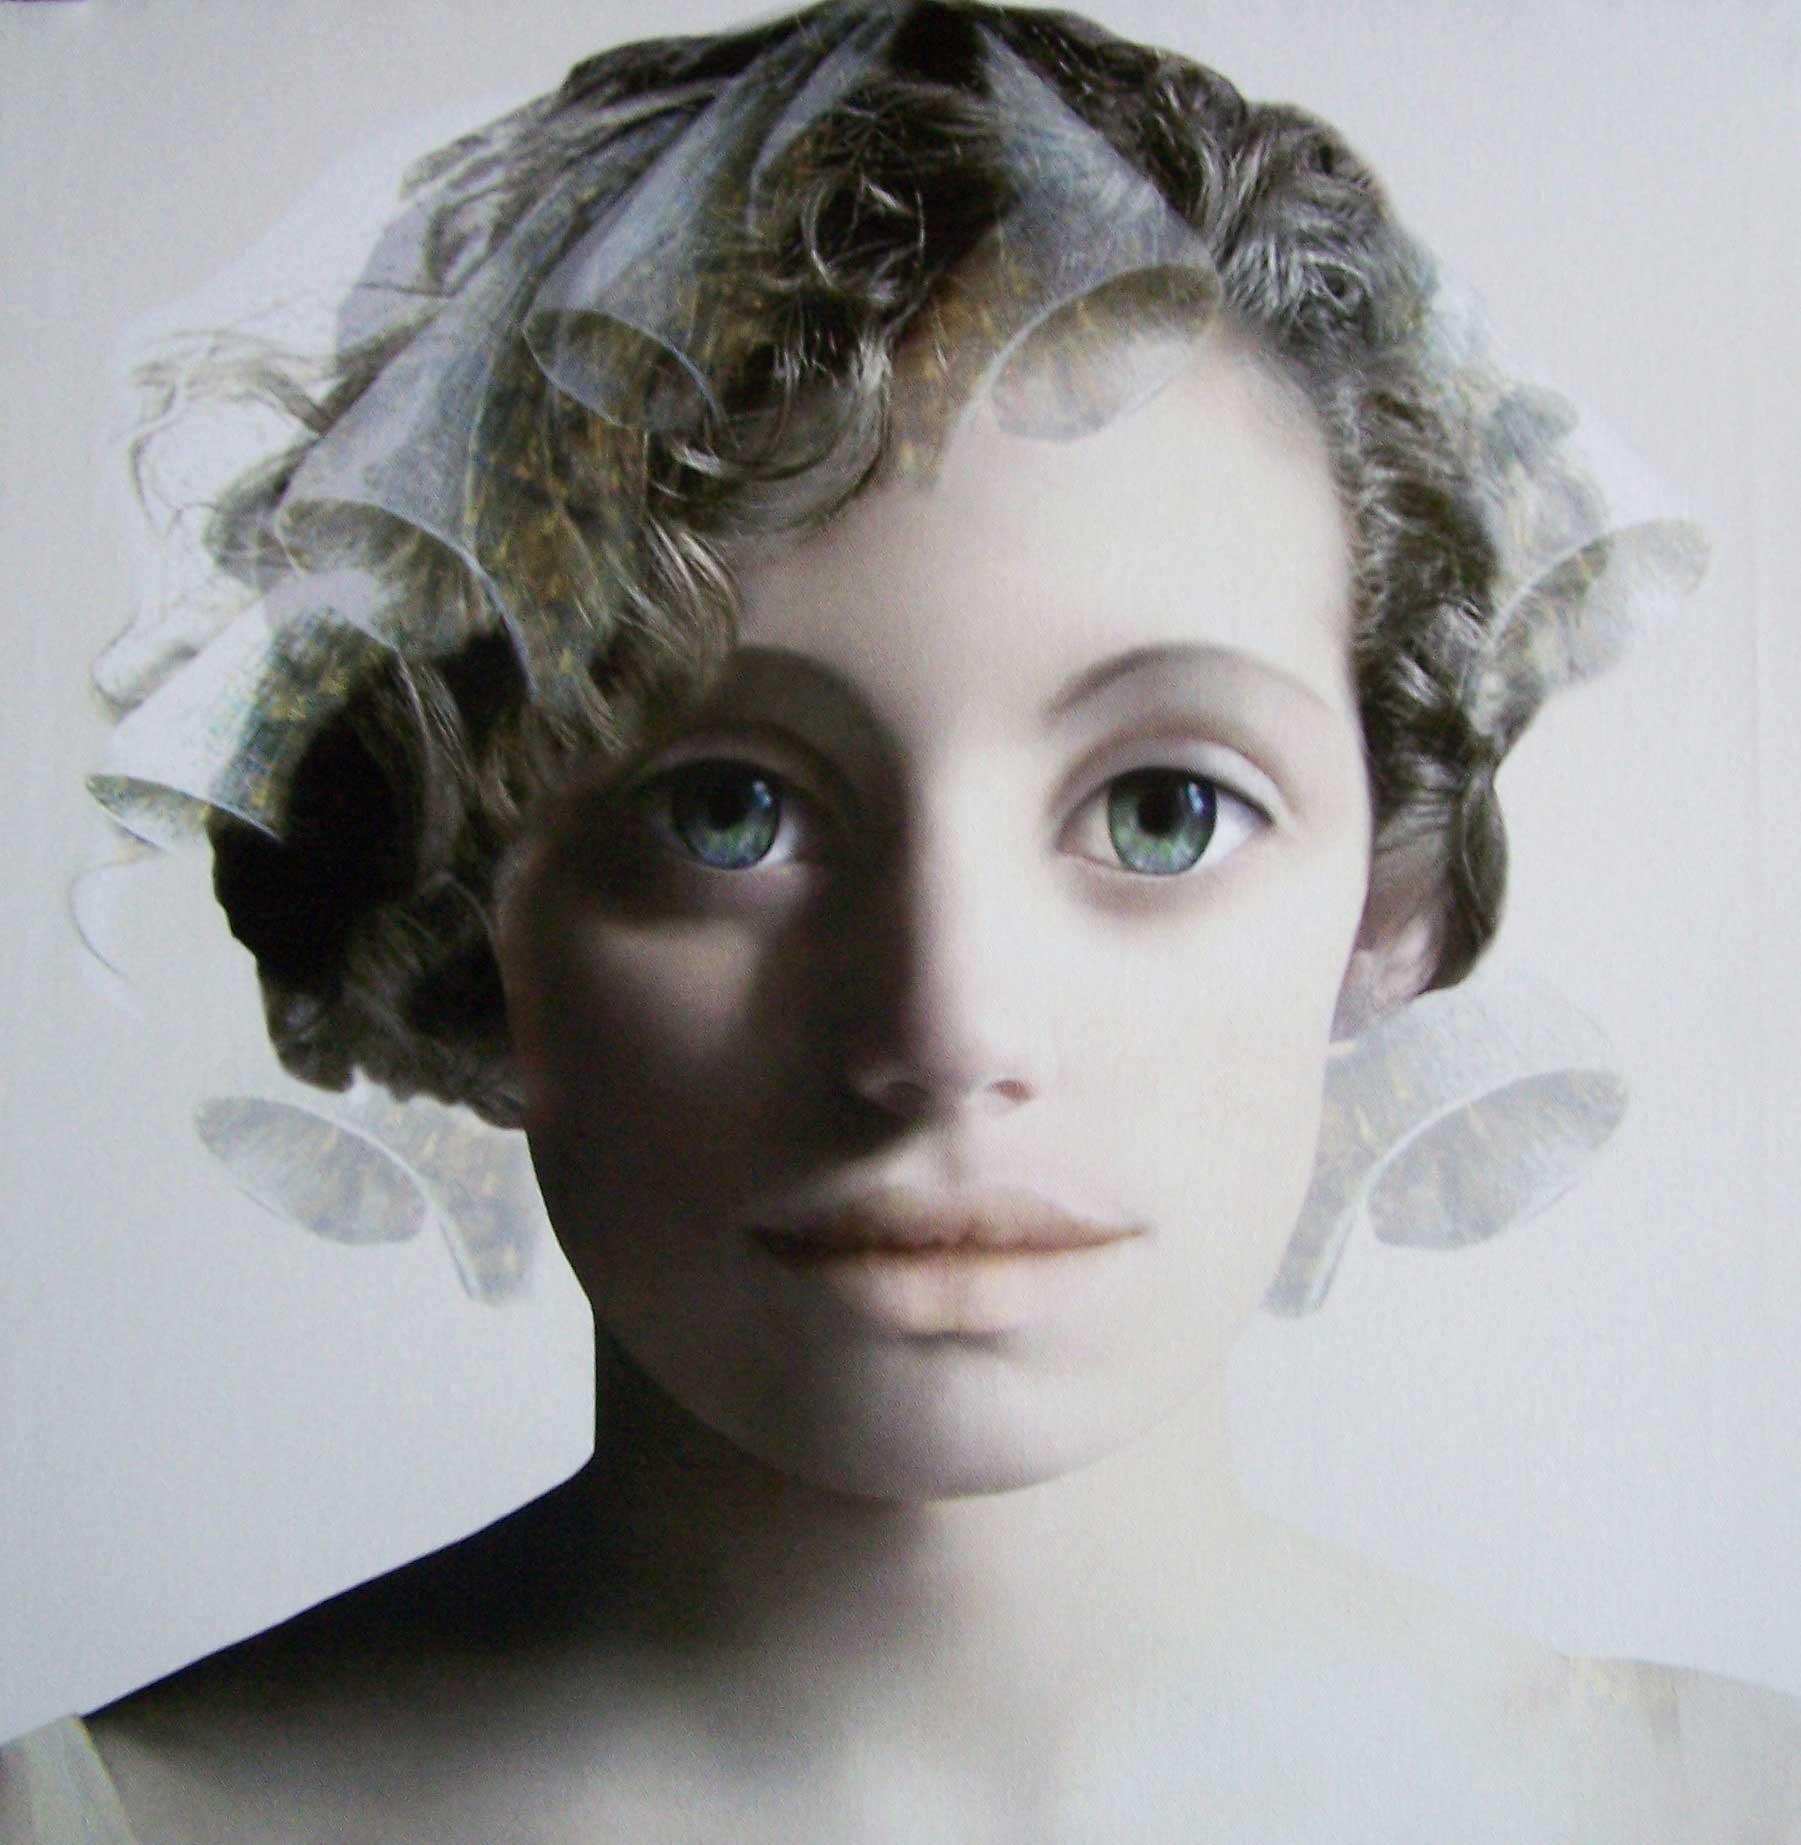 Barberis-Milena_Chiara-n-3_2011_pittura-digitale-su-tela_cm-60x60